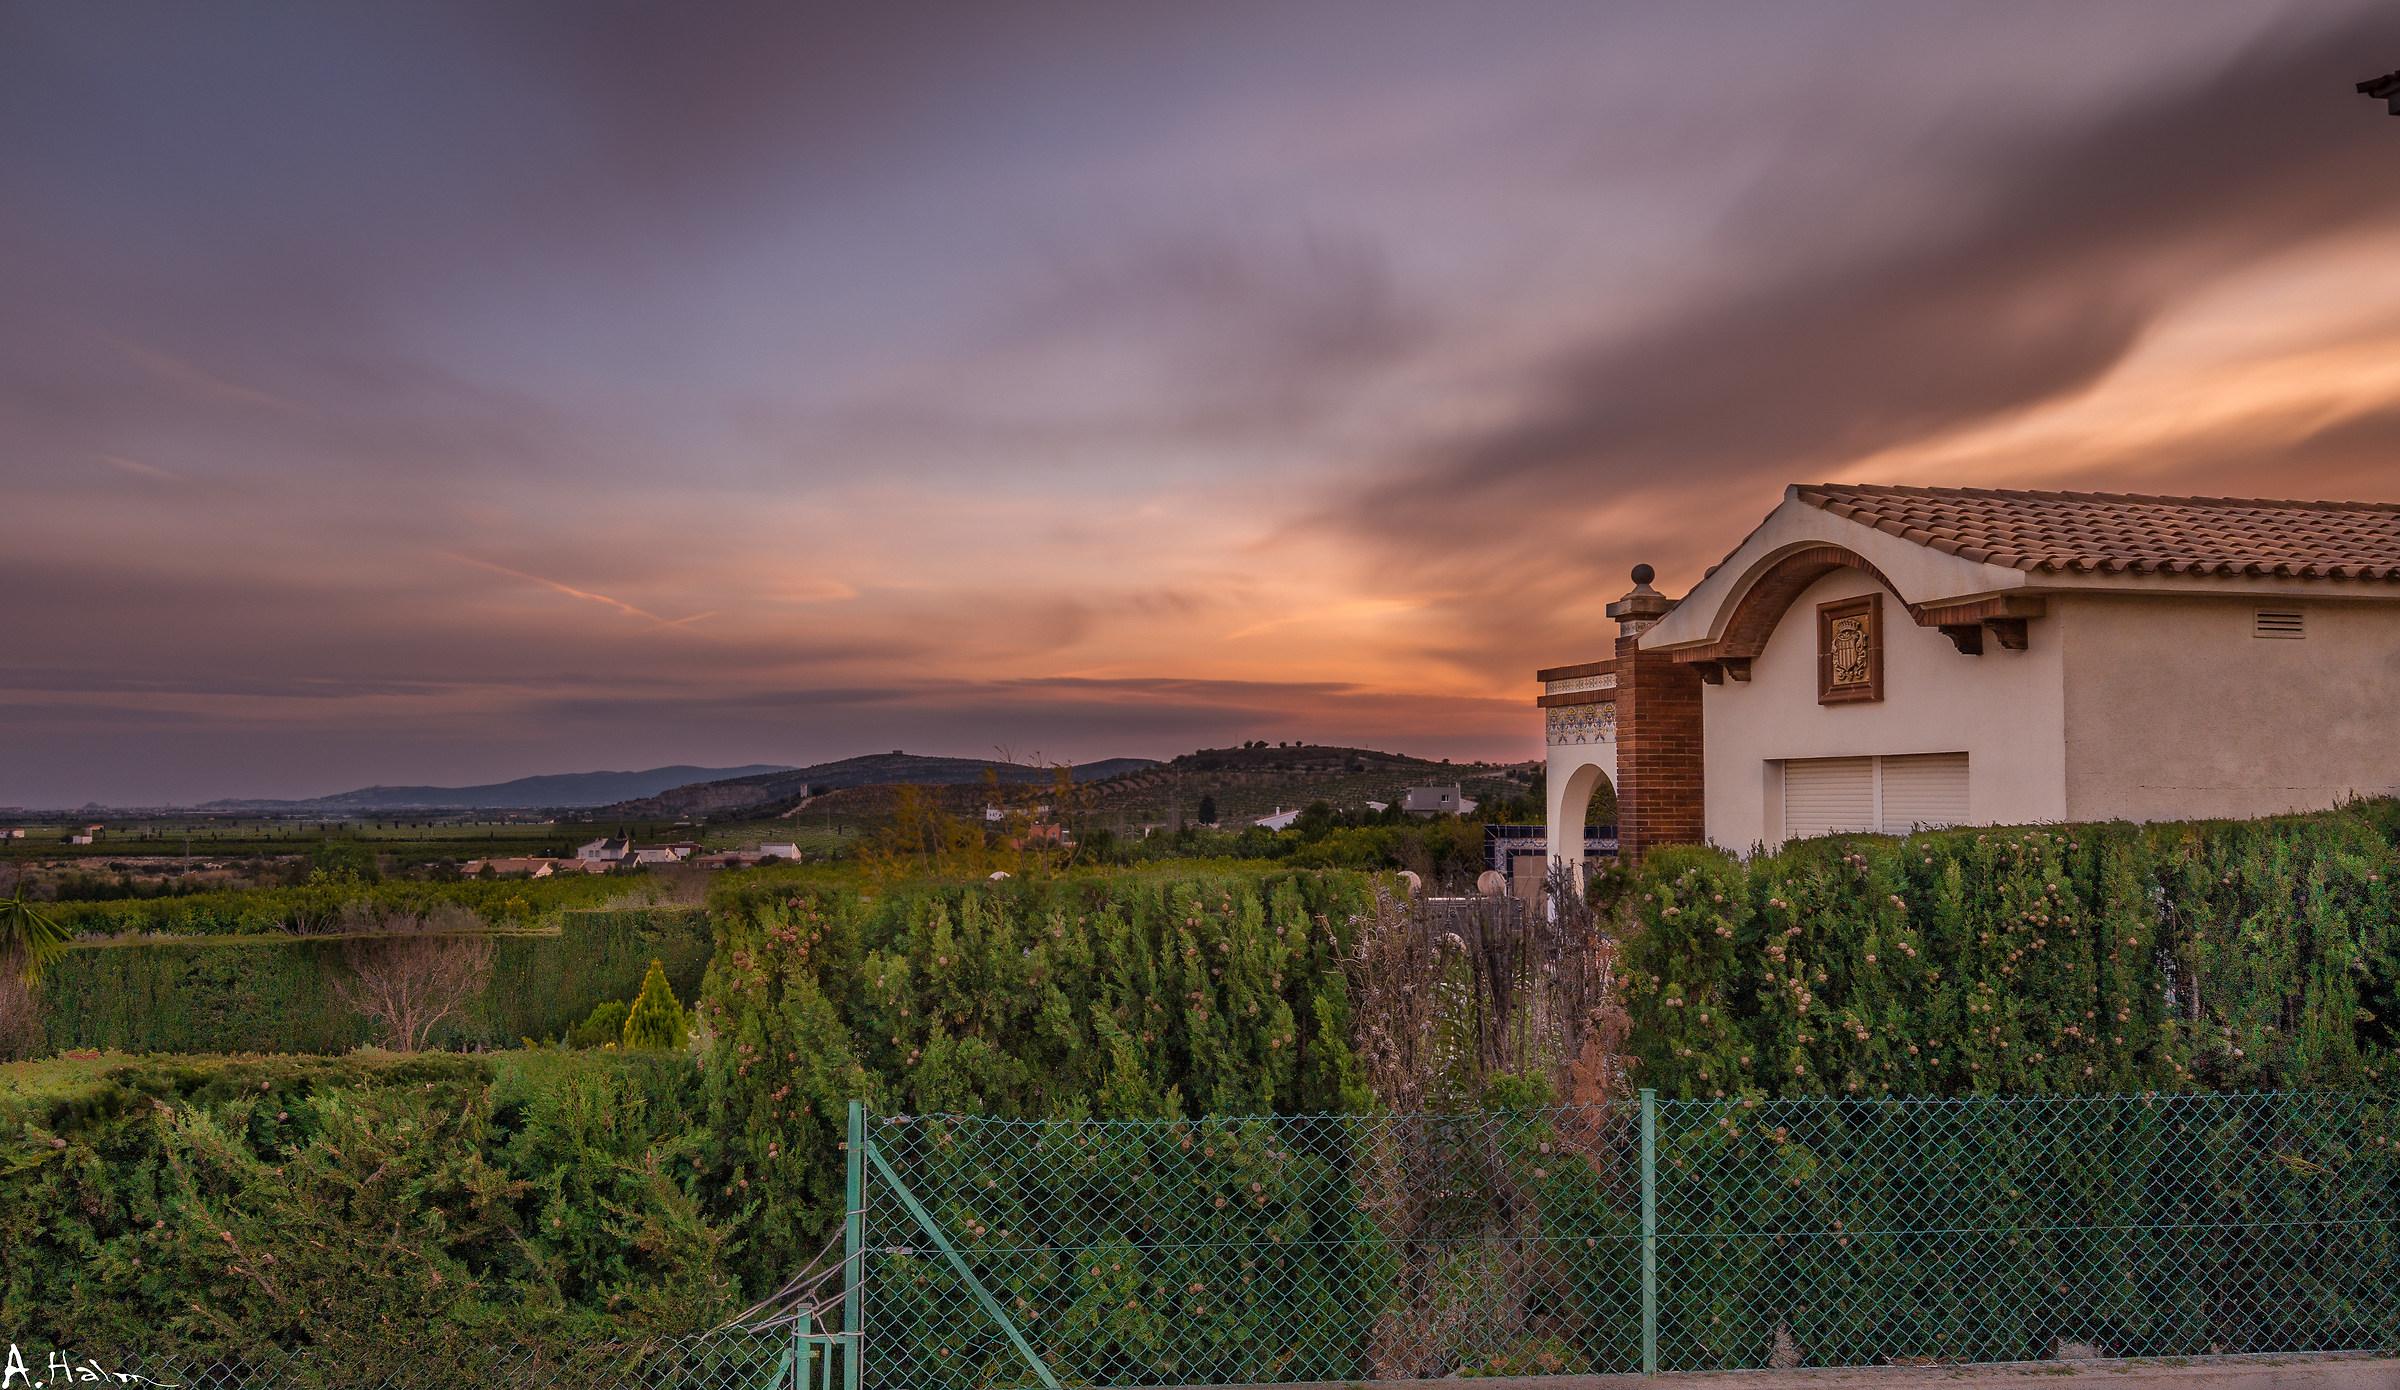 Dreamy Sunset in Vinaroz, Spain...